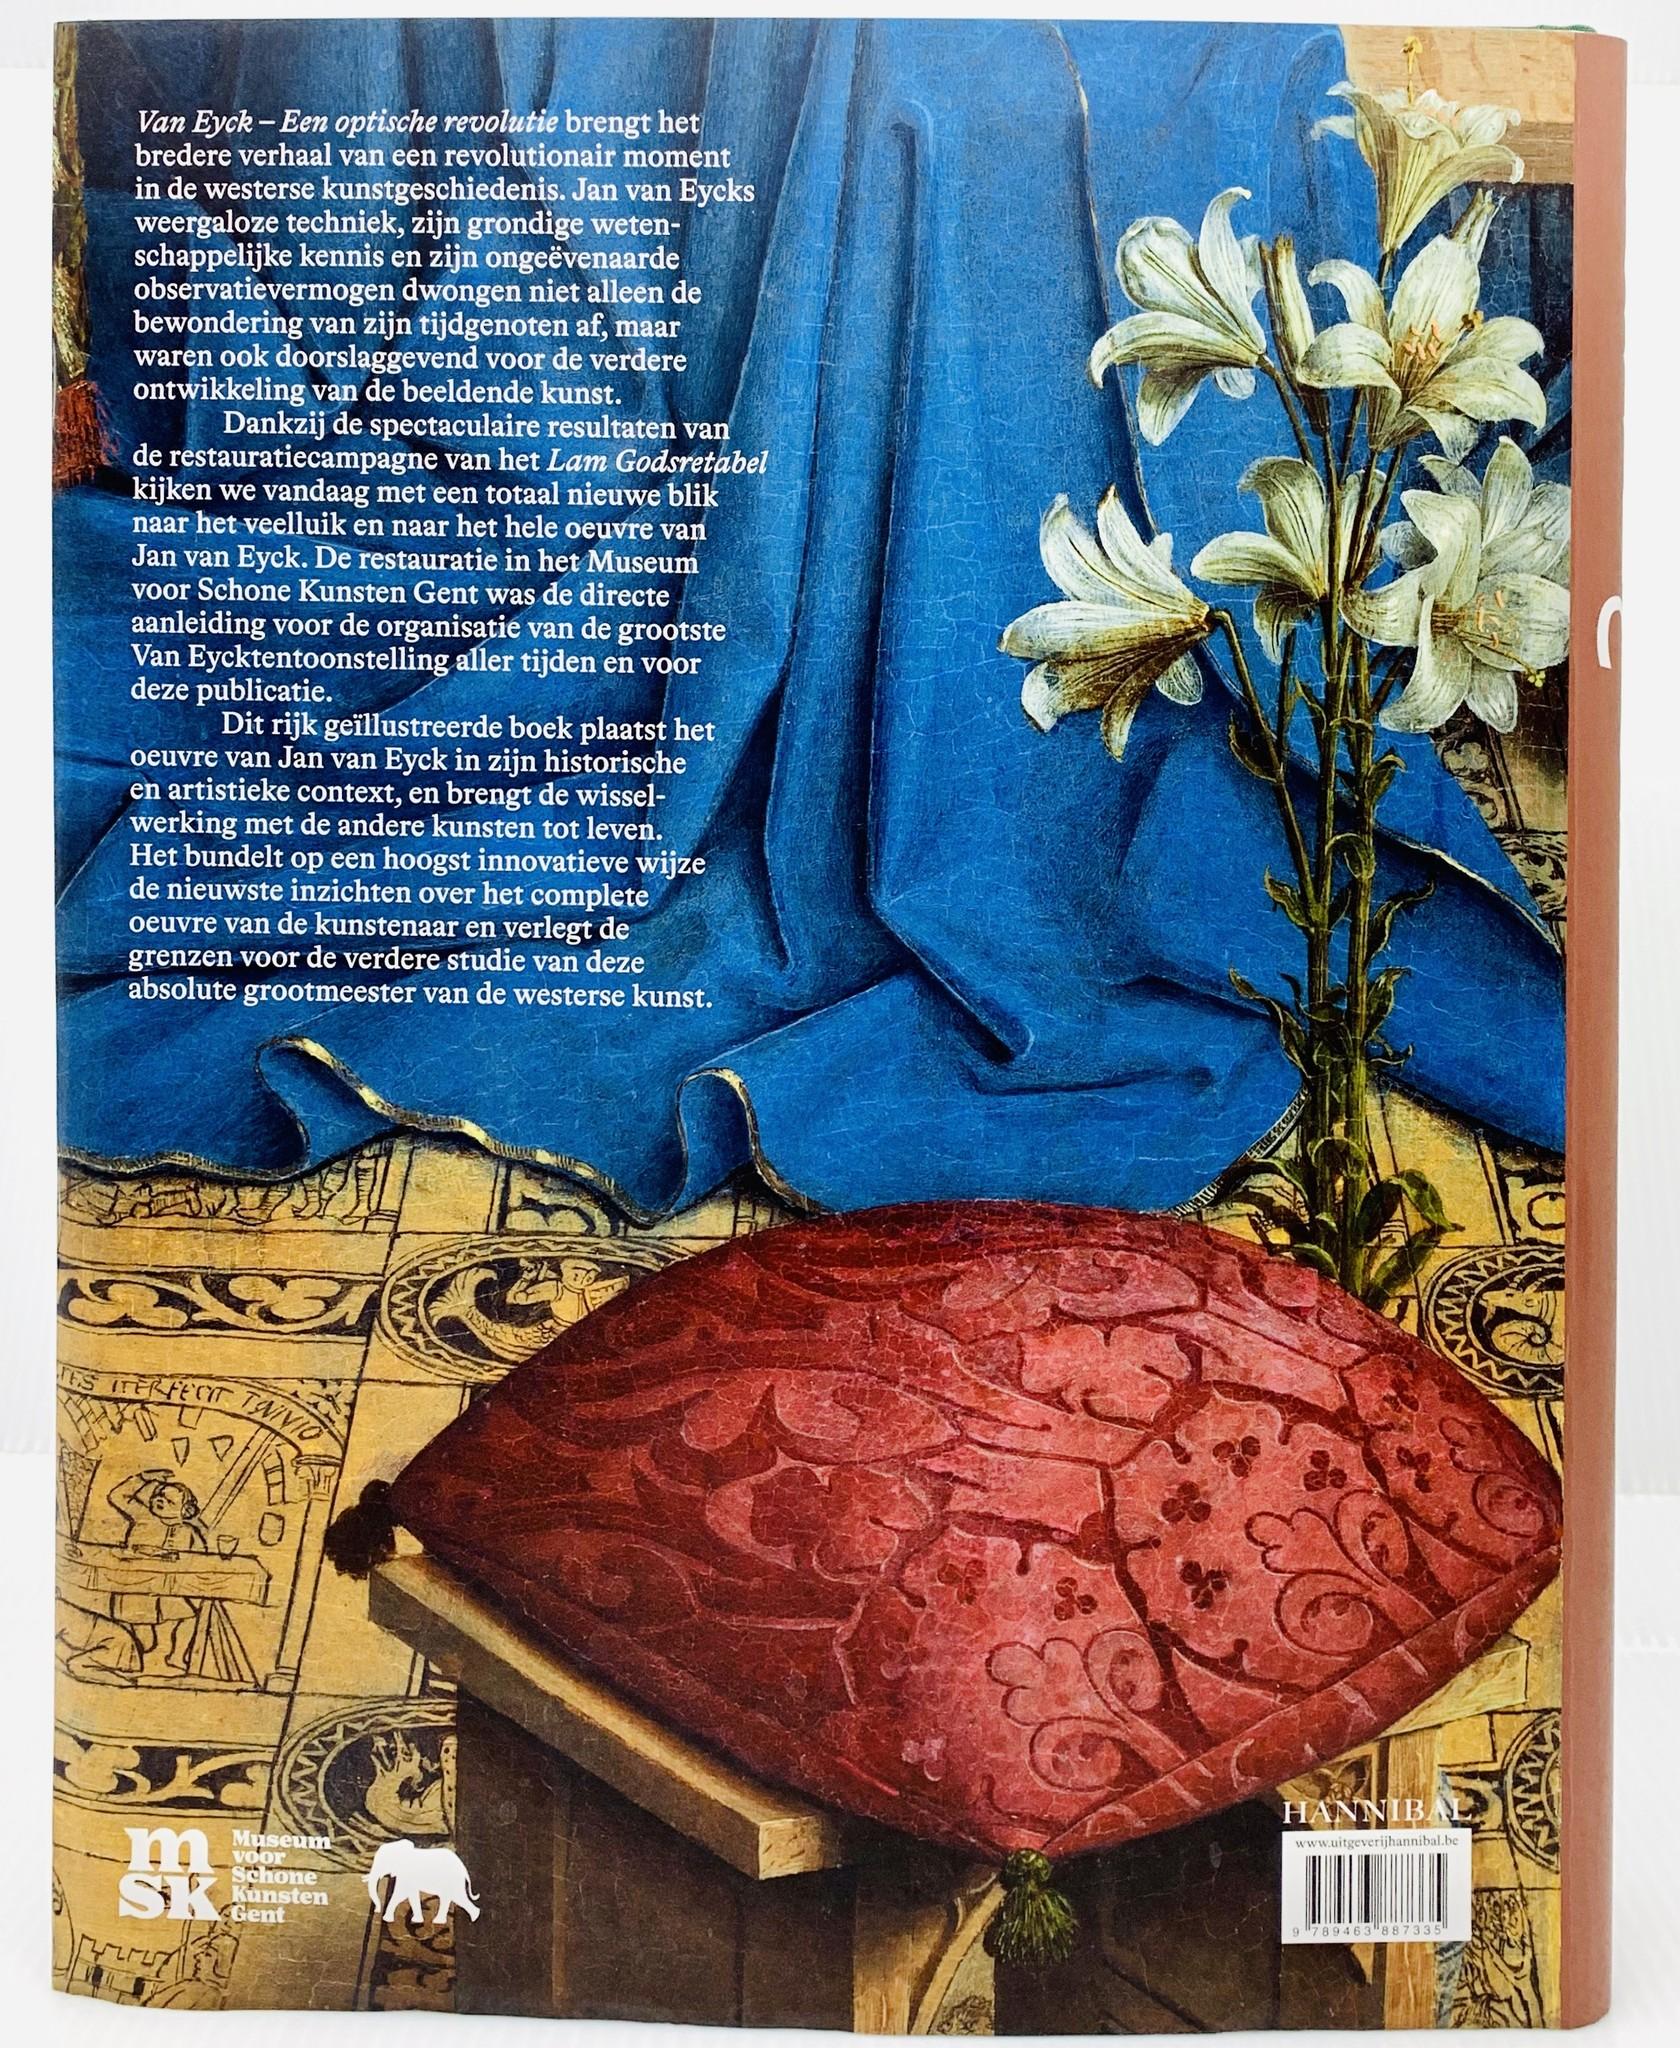 MSK Catalogue 'Van Eyck - Une révolution optique' (French) - MSK